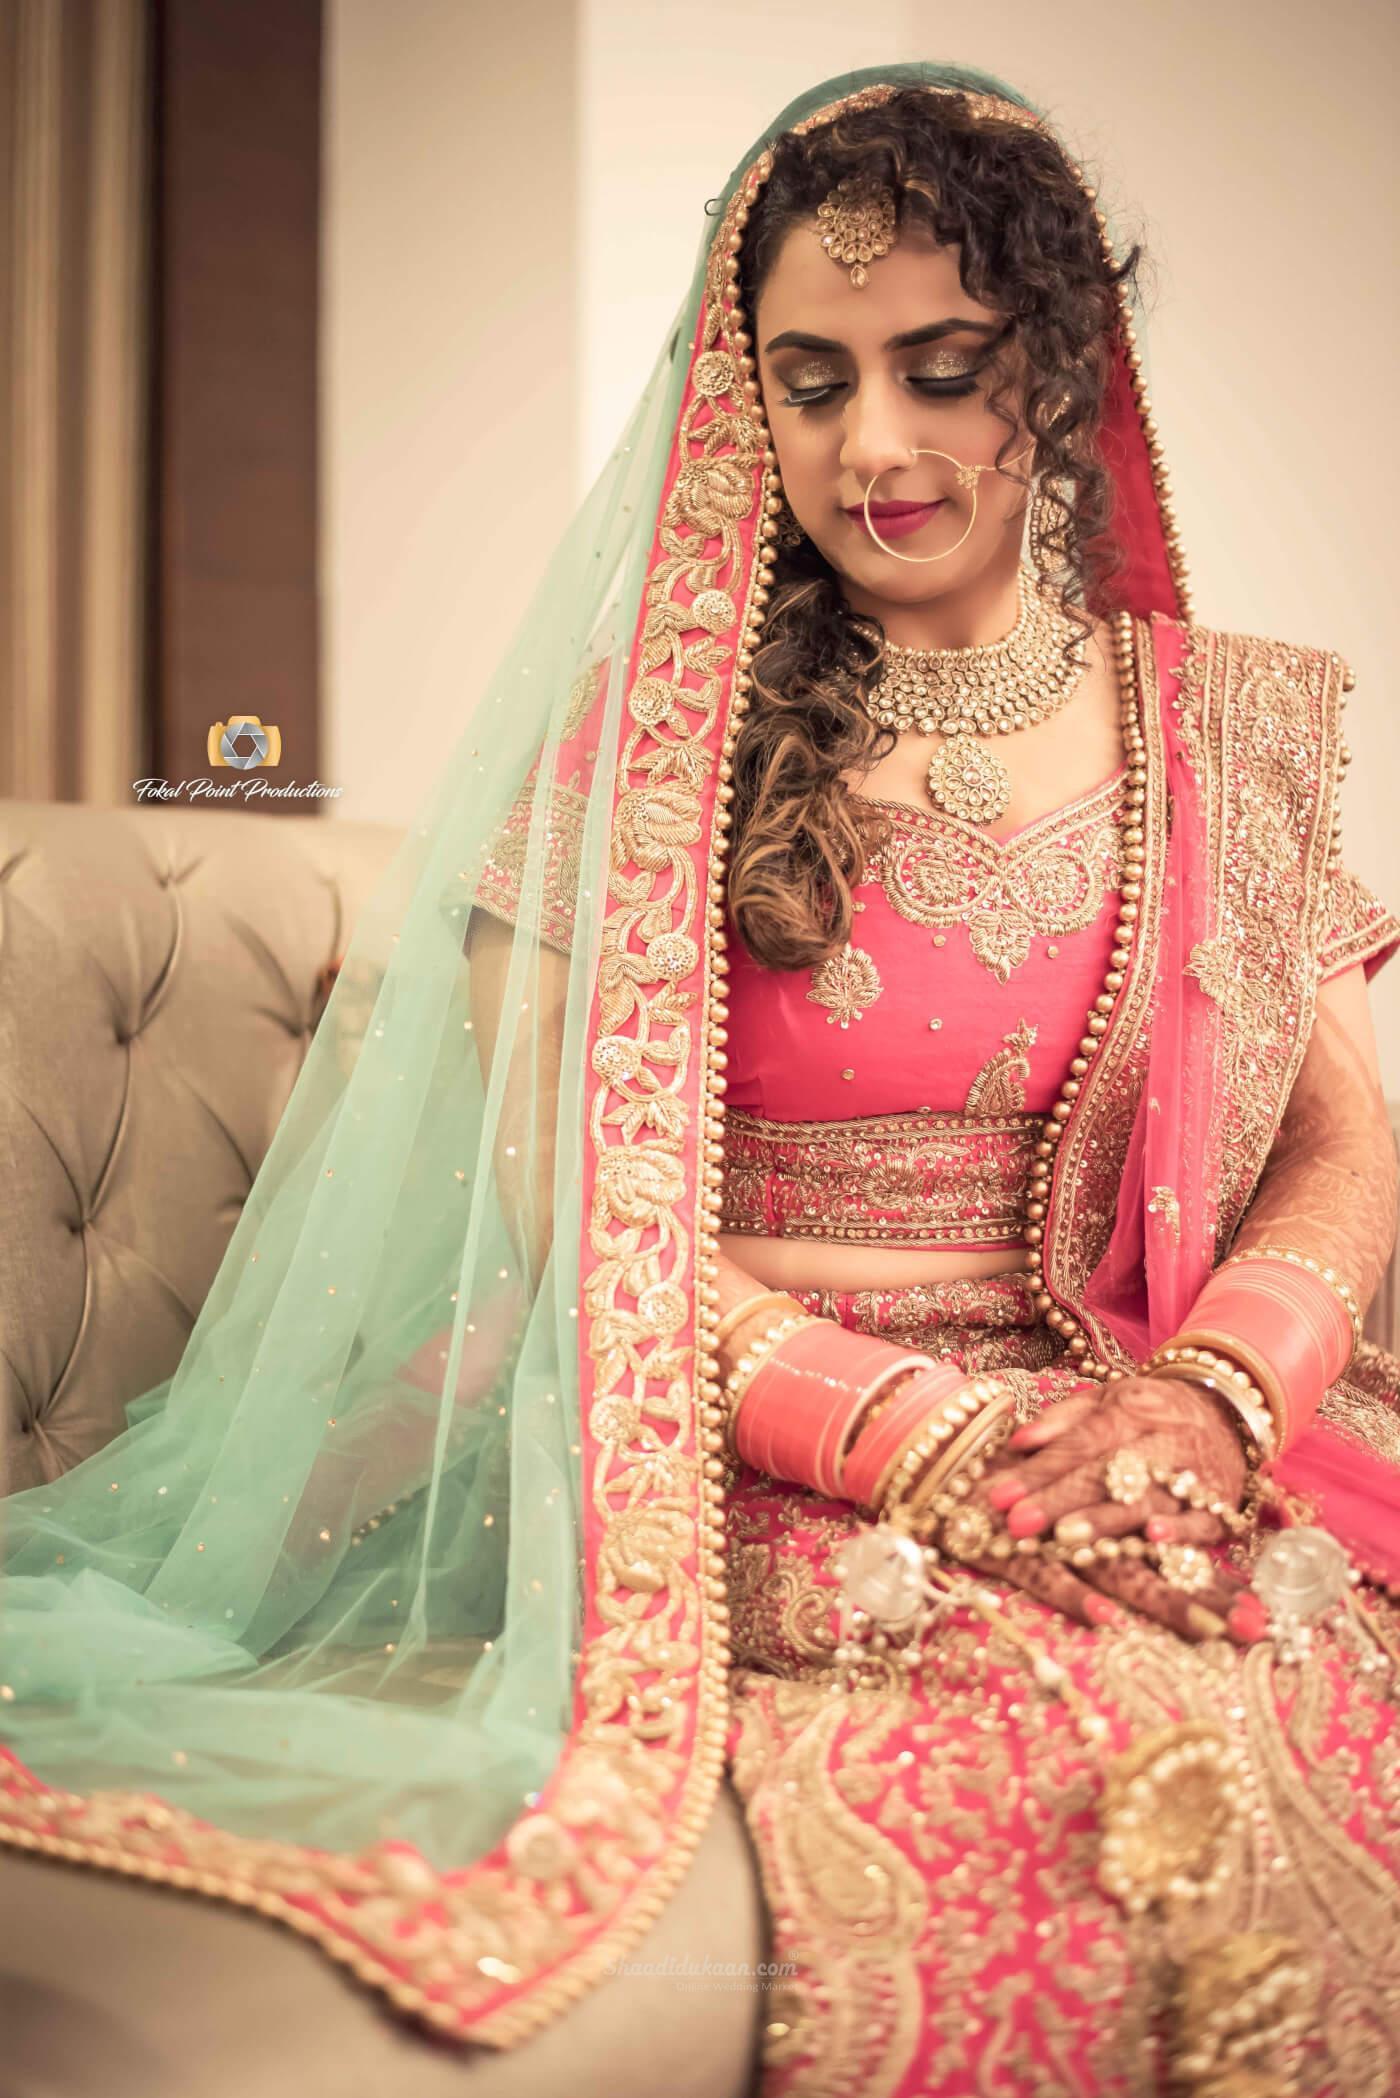 Garima Weds Arjun